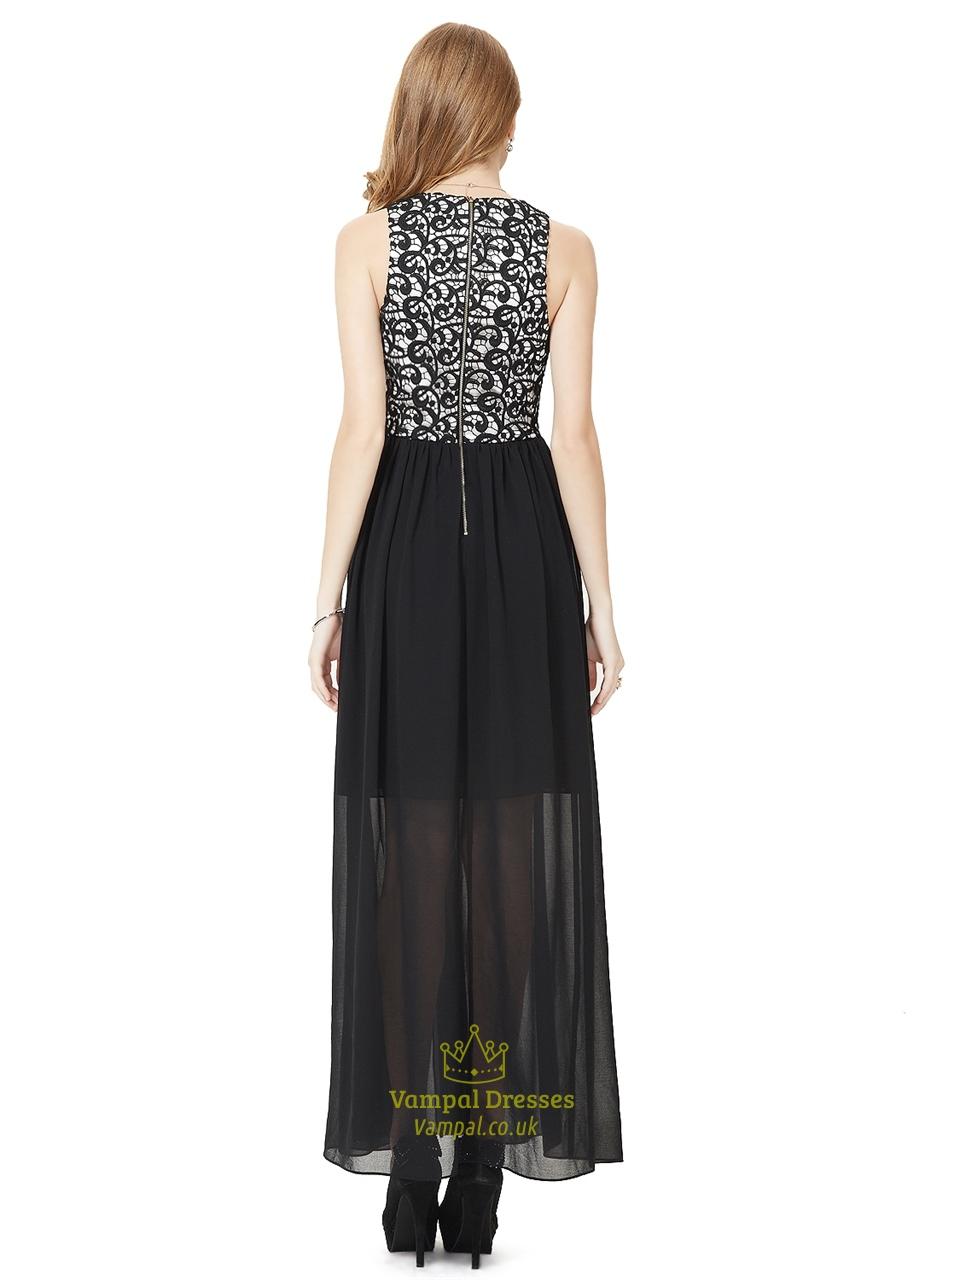 Black Lace Bodice Chiffon Bridesmaid Dress With Split